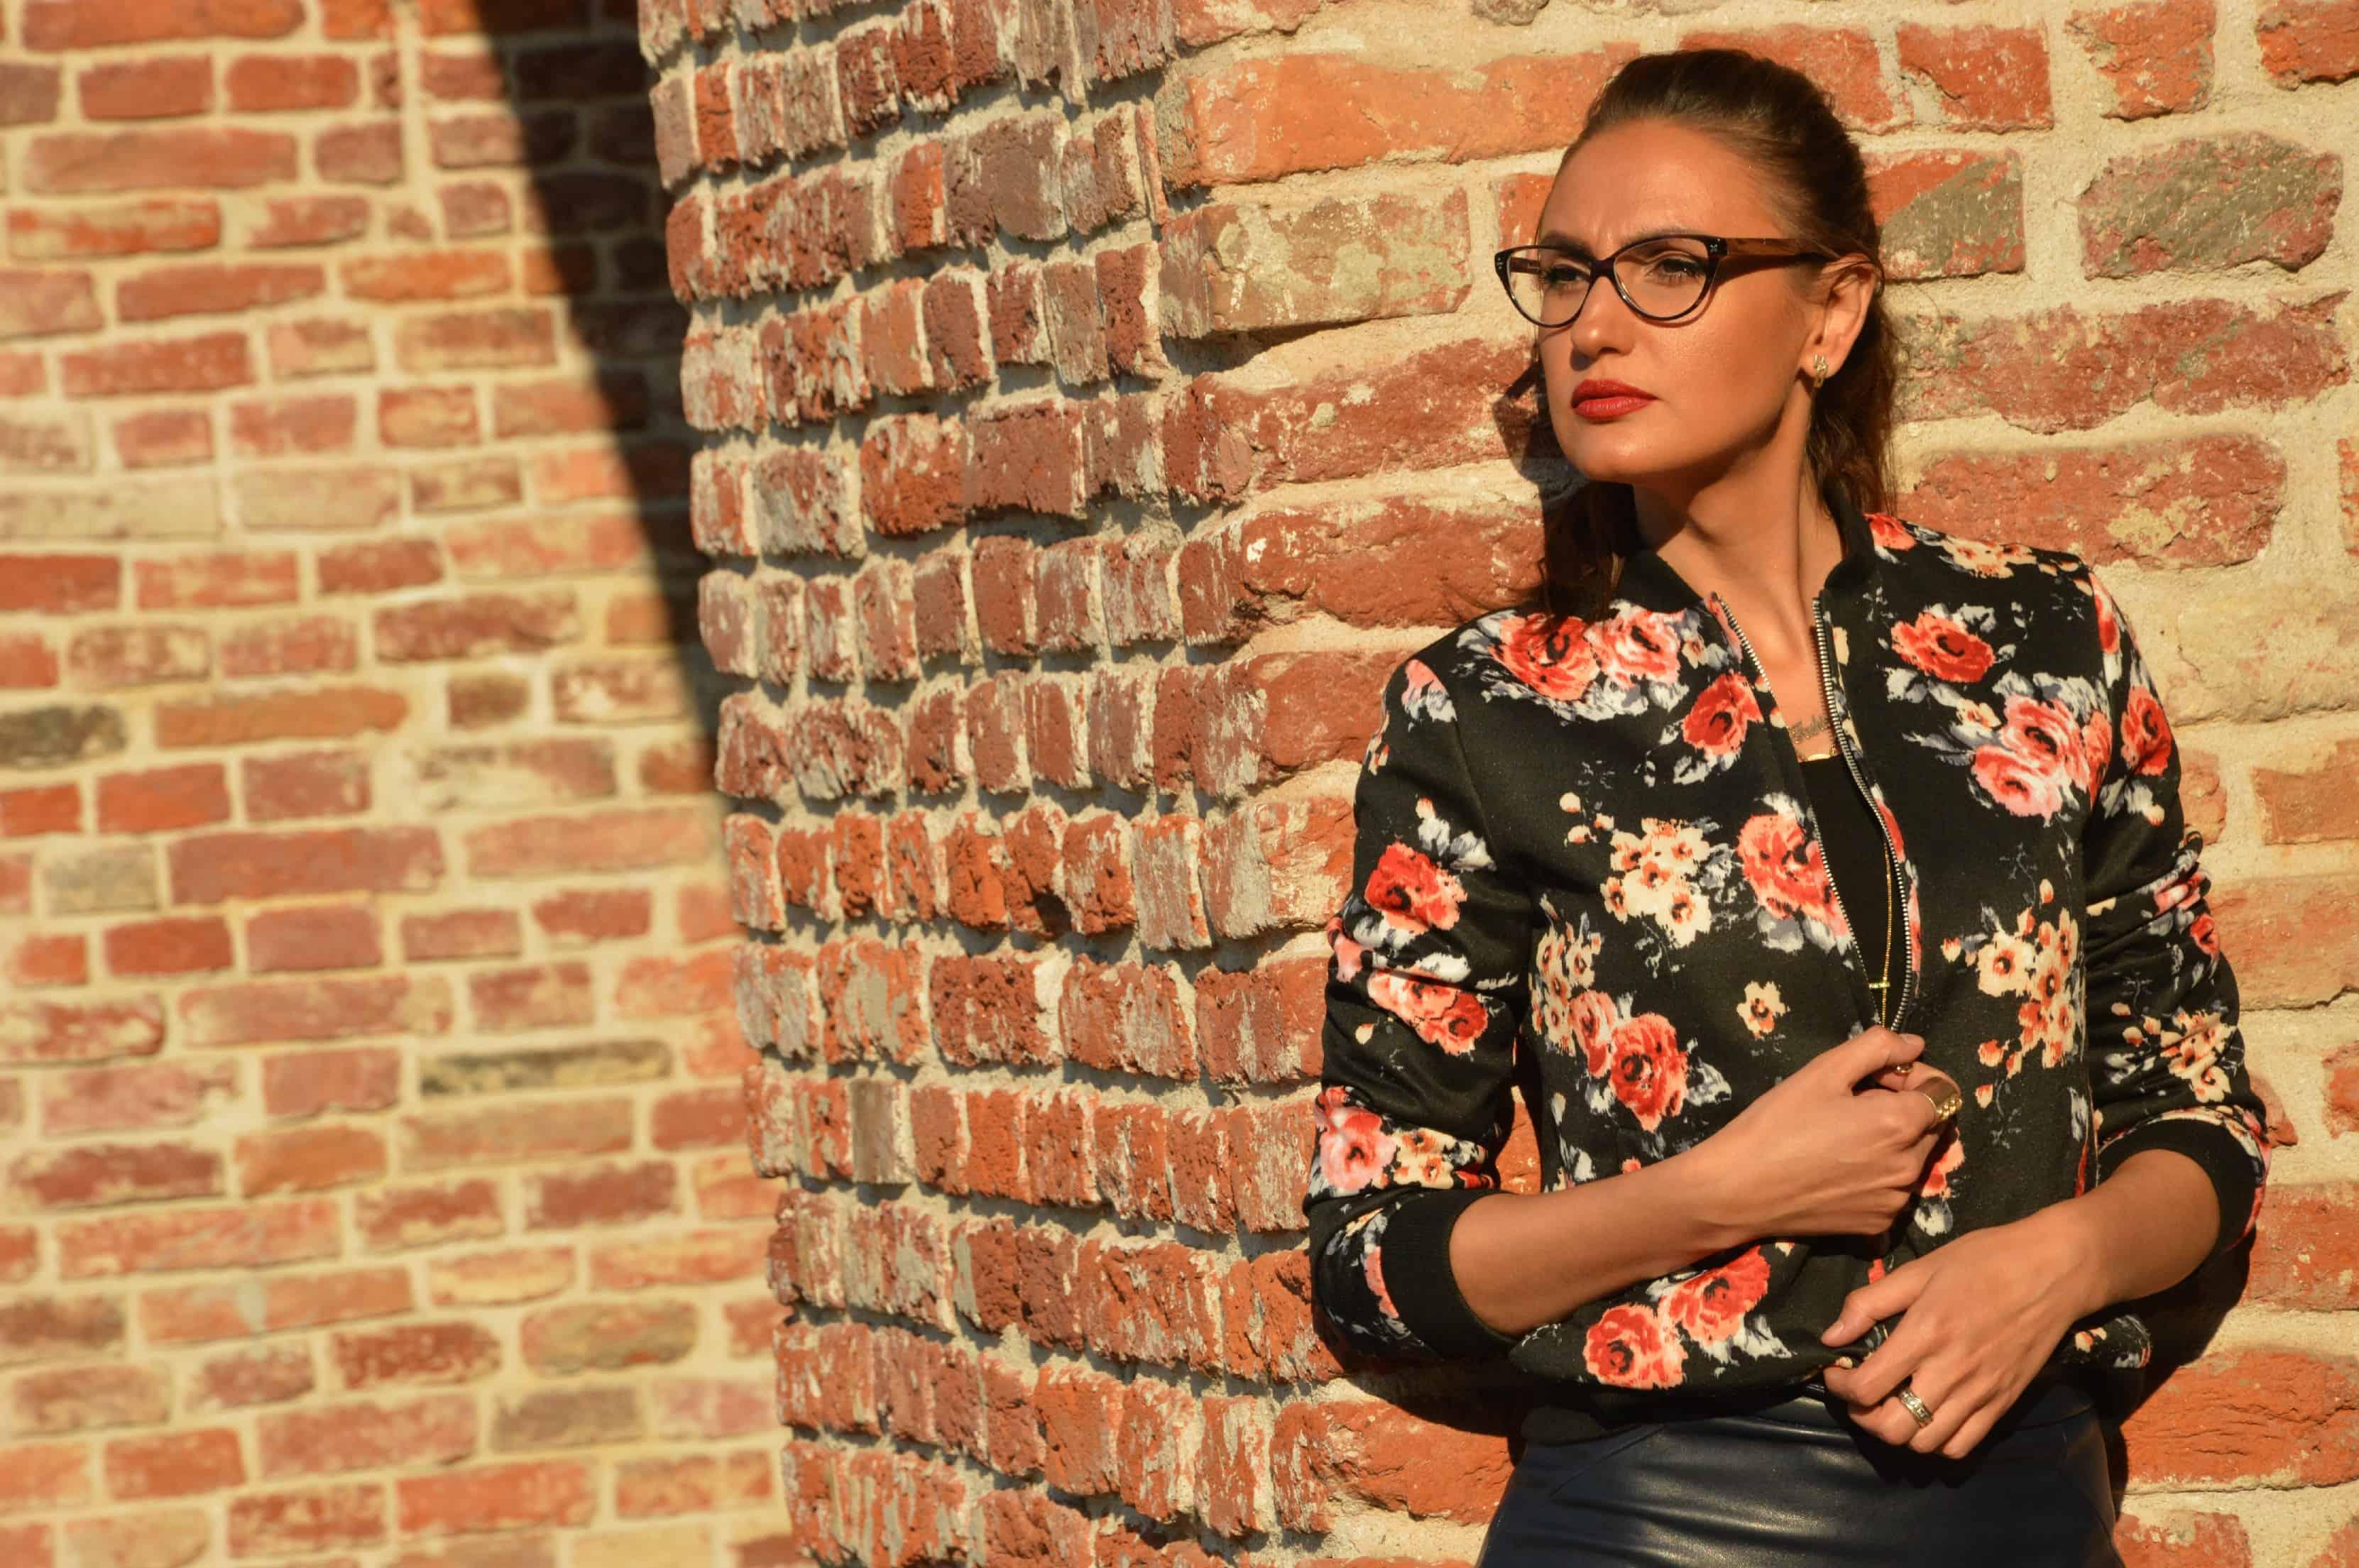 lensway-eyewear-derek-cardigan-glasses-thefashiontag-look-9